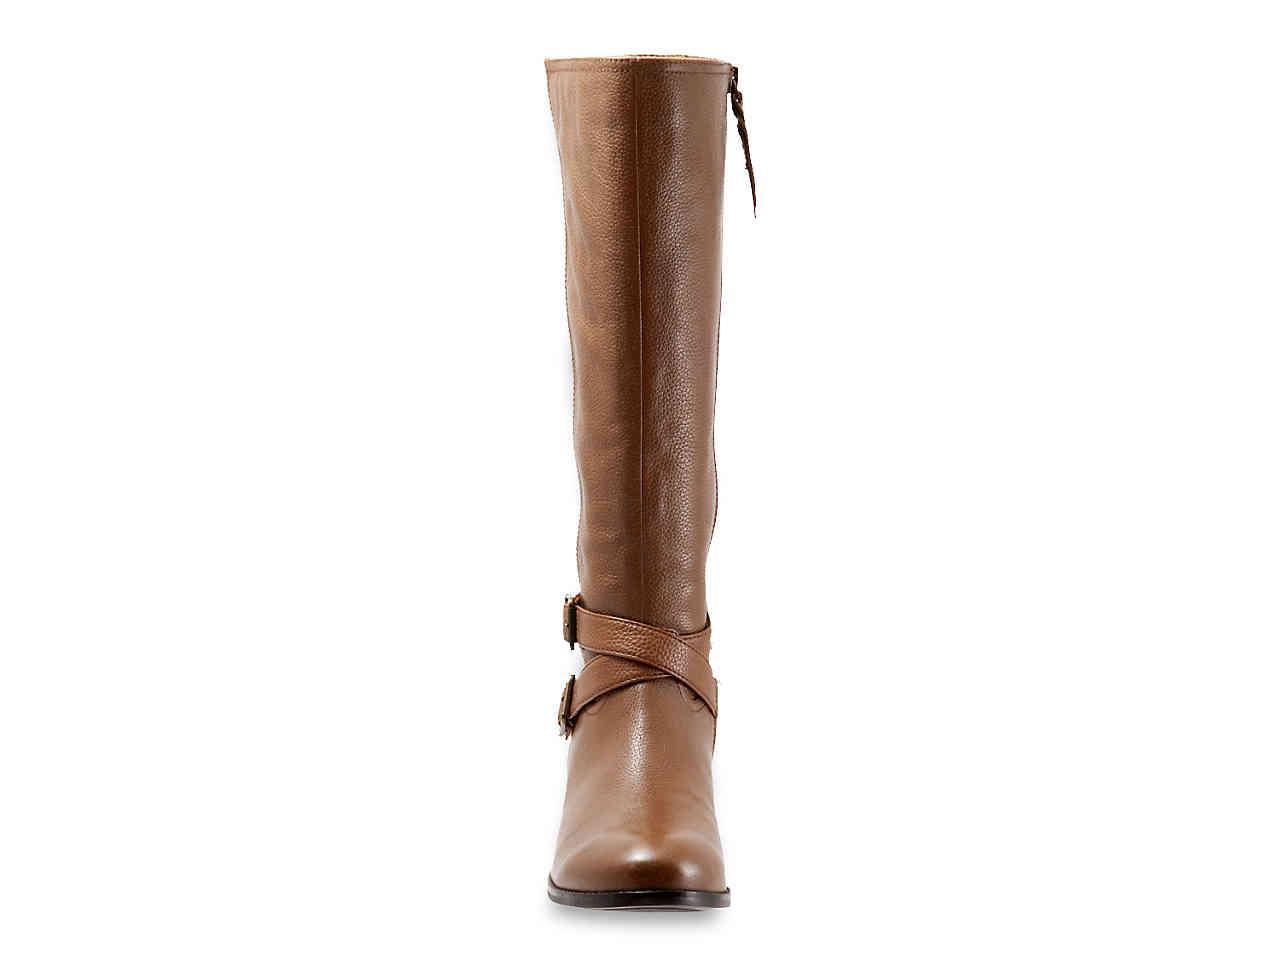 f015e24e59c Trotters - Brown Liberty Wide Calf Riding Boot - Lyst. View fullscreen